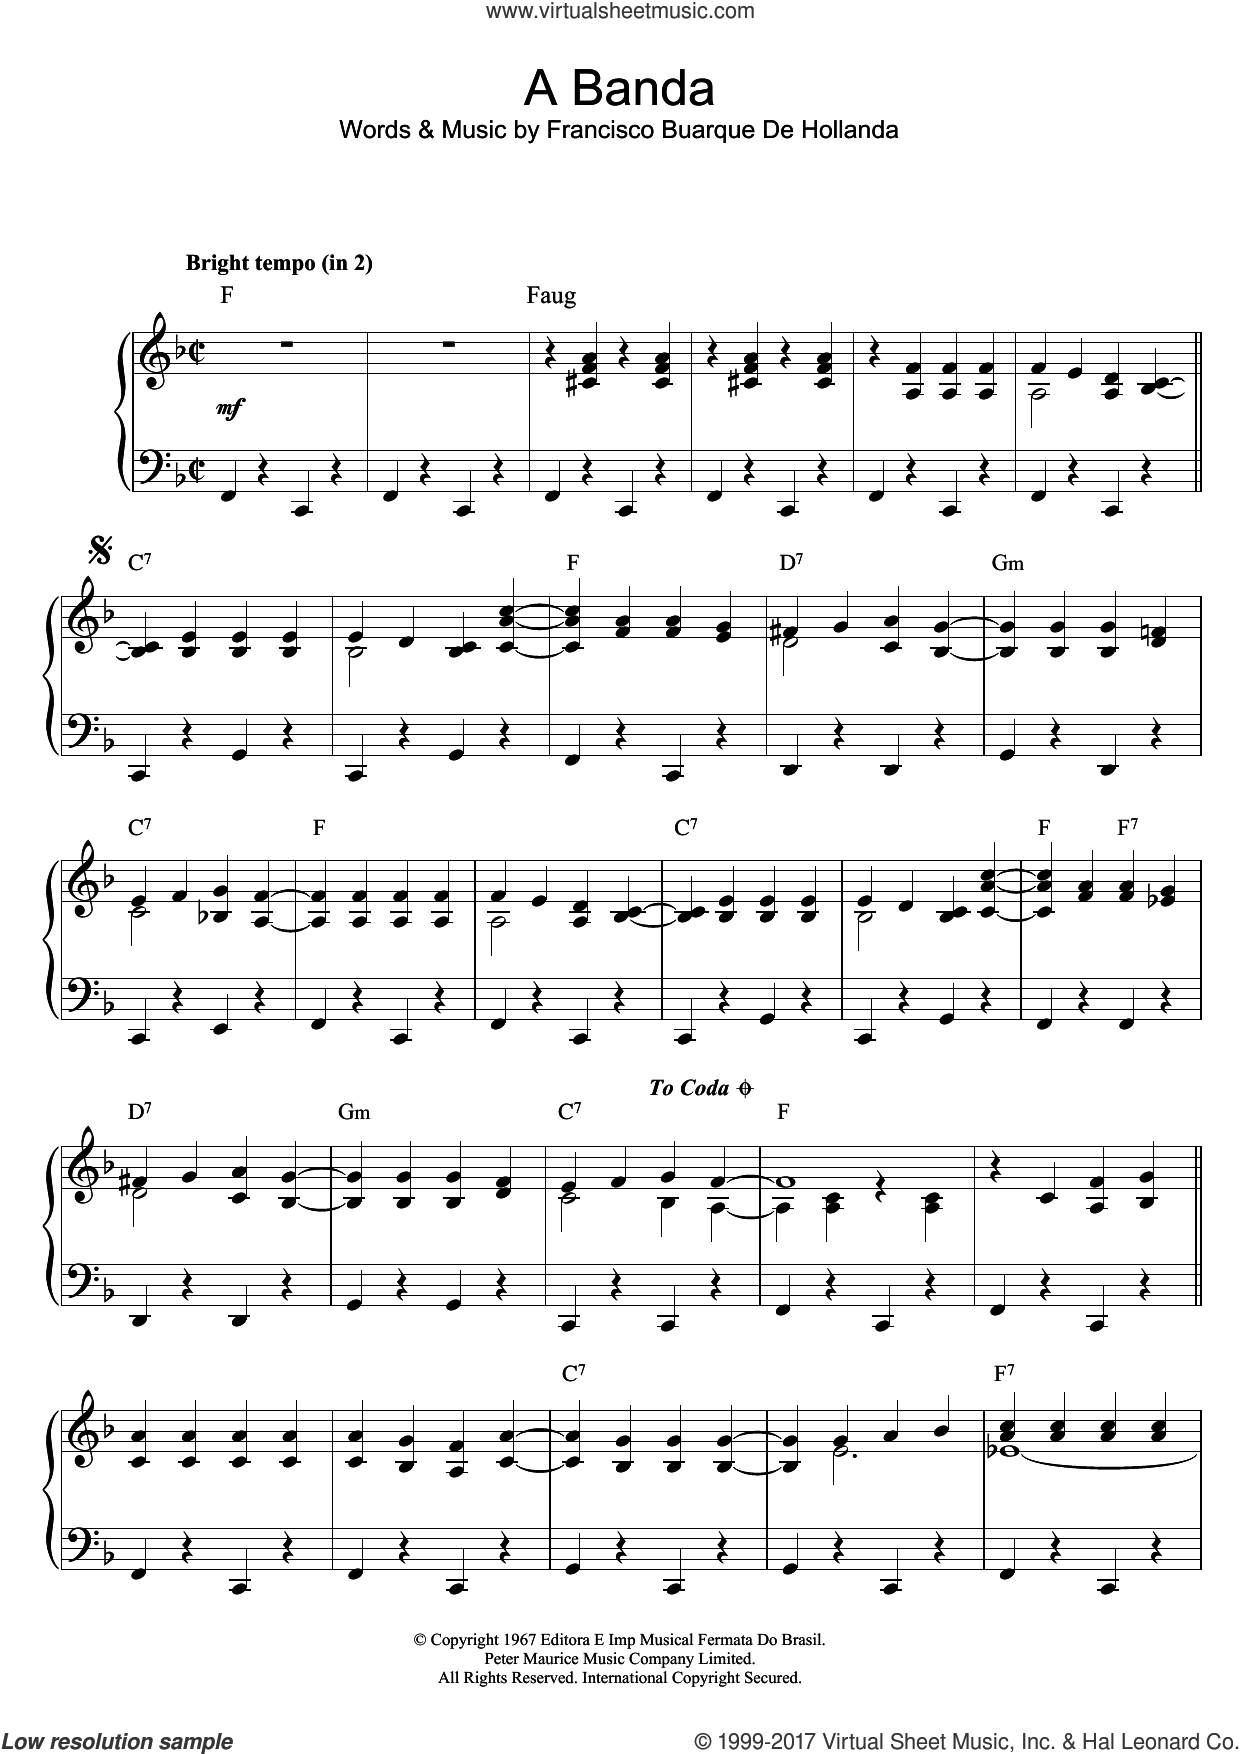 A Banda sheet music for piano solo by Herb Alpert & The Tijuana Brass and Francisco Buarque De Hollanda, intermediate skill level